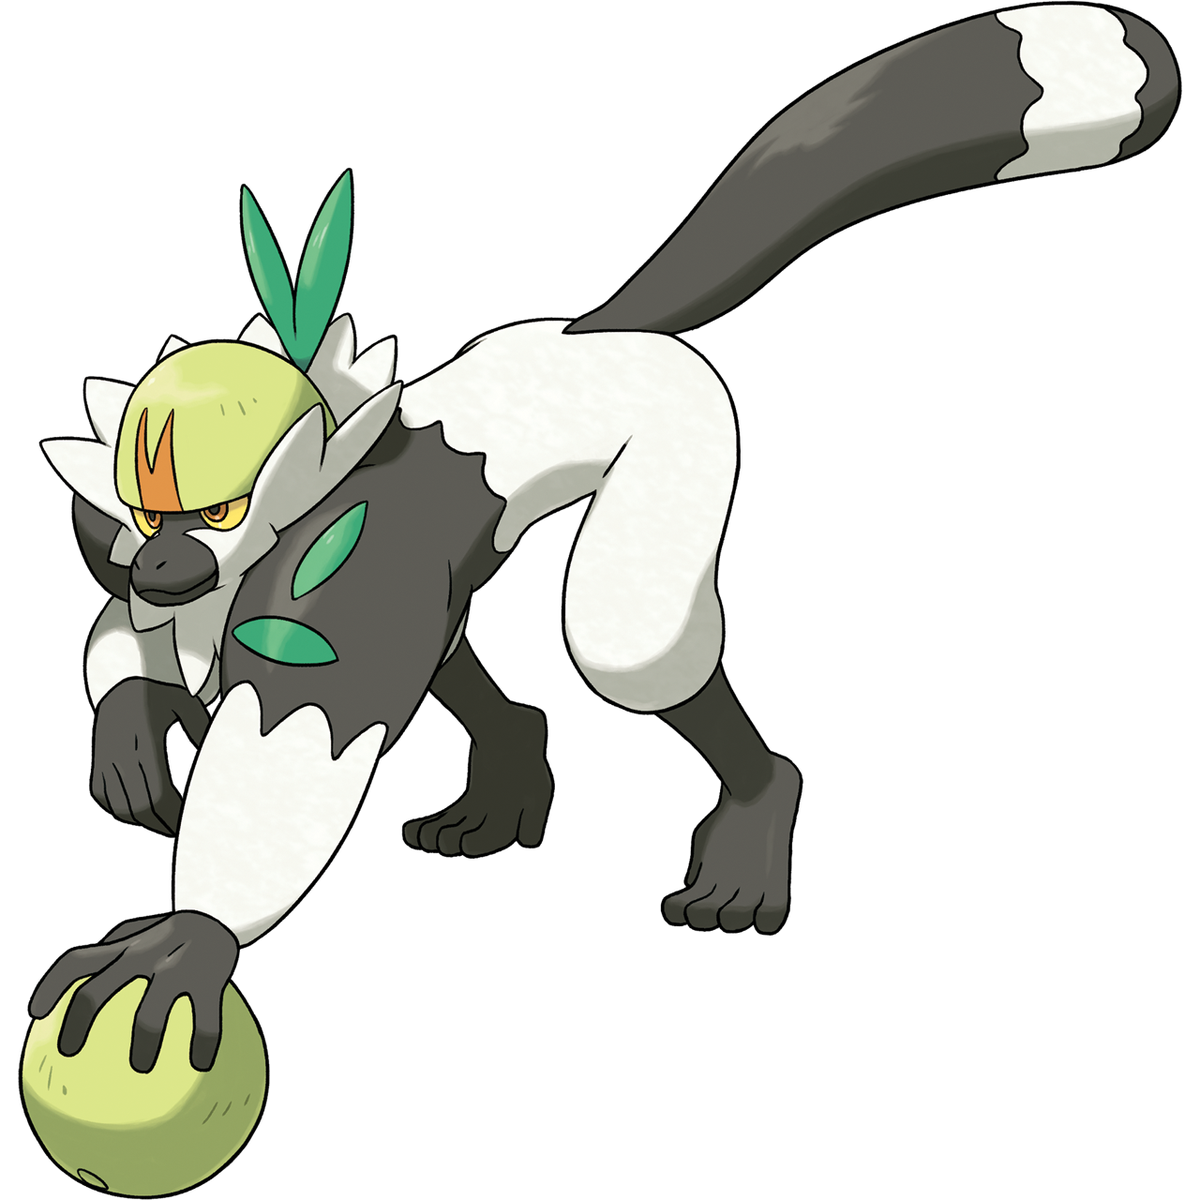 Passimian is a Pokémon Shield exclusive